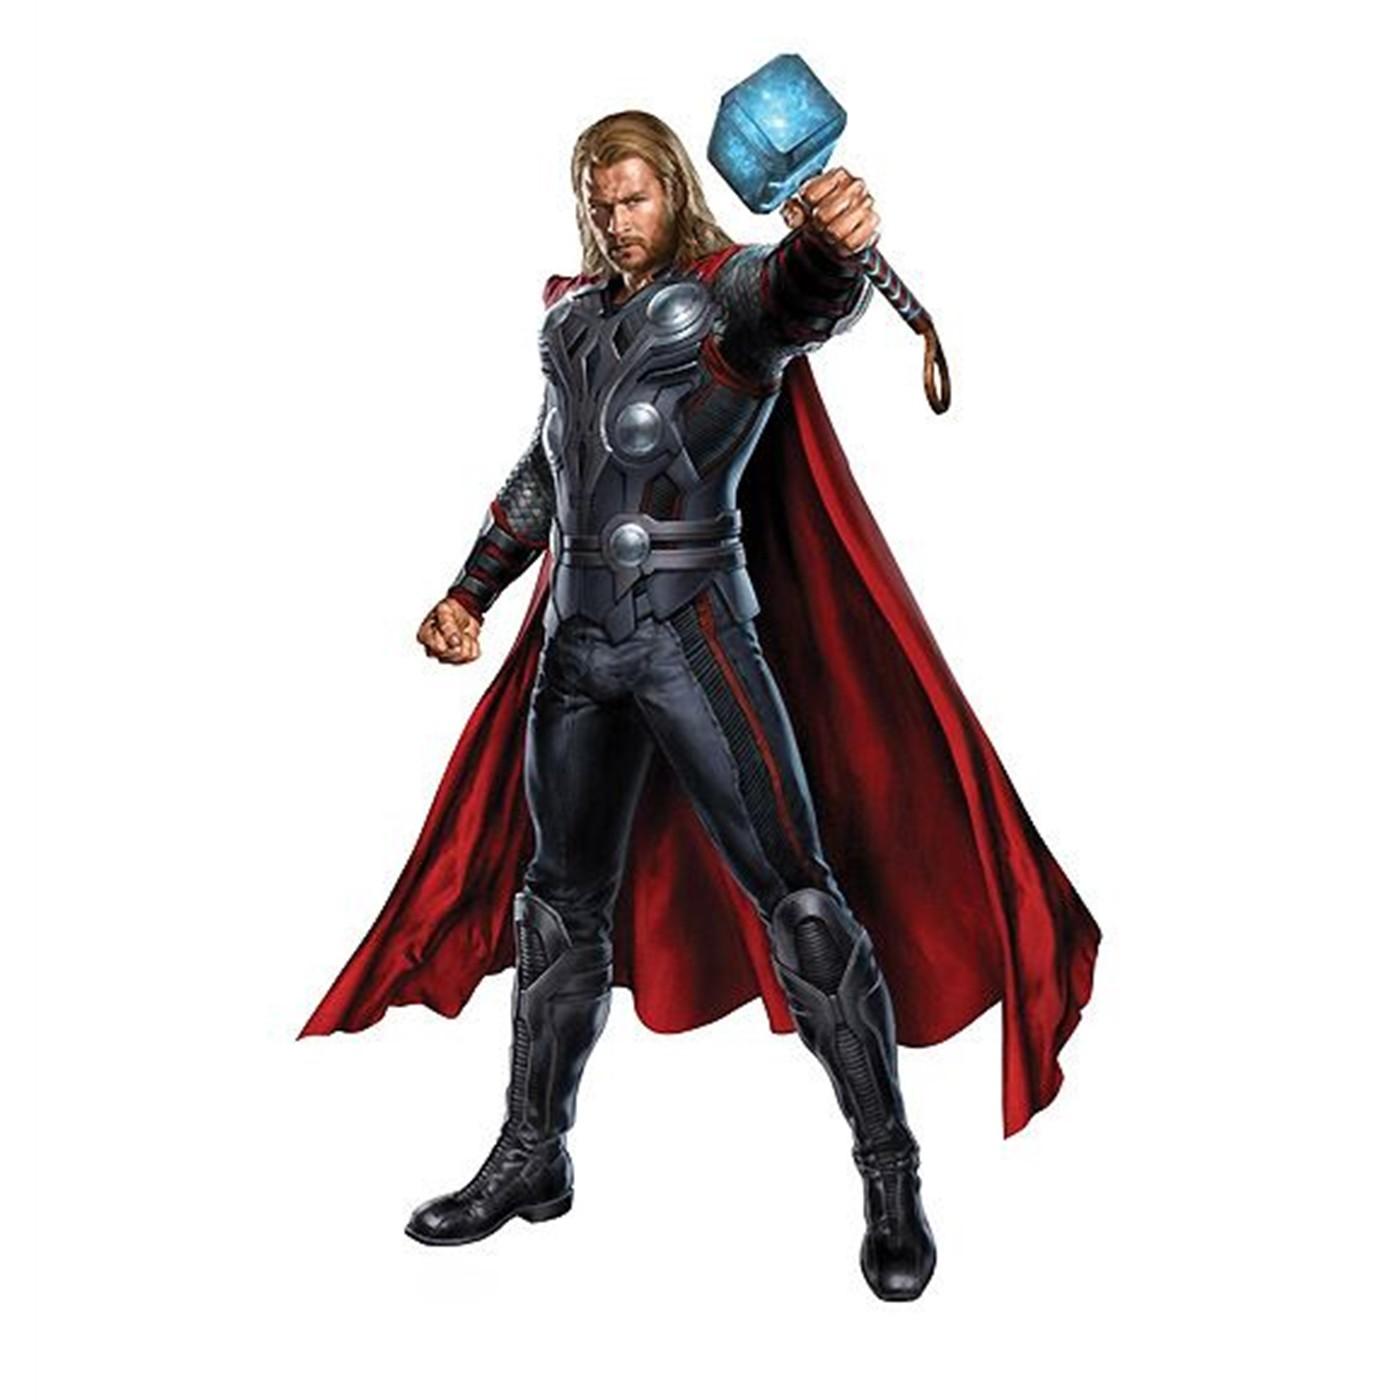 The Avengers Movie Thor Cardboard Standup